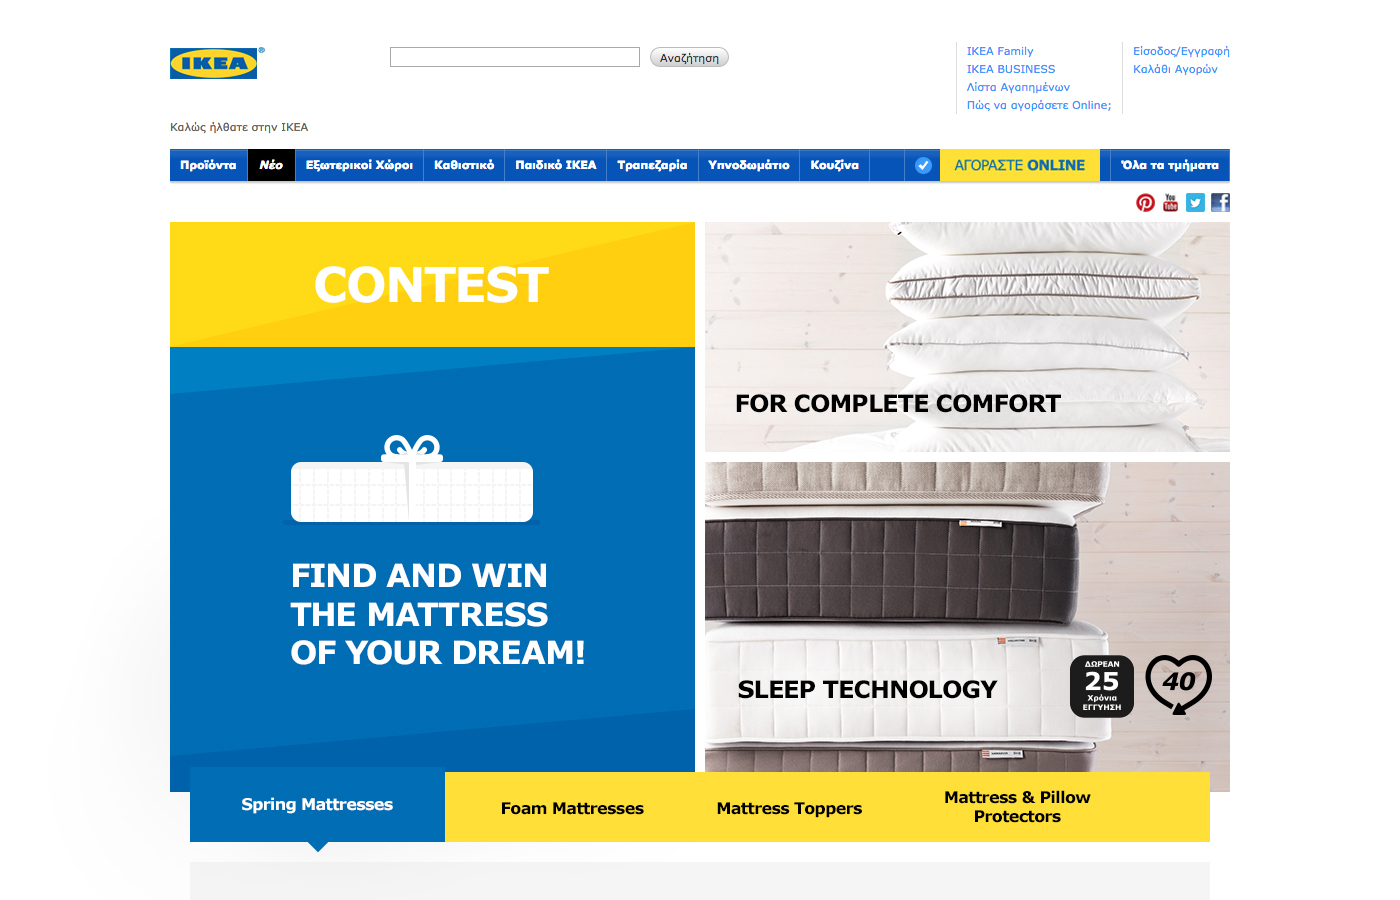 IKEA Mattresses - Contest Banner